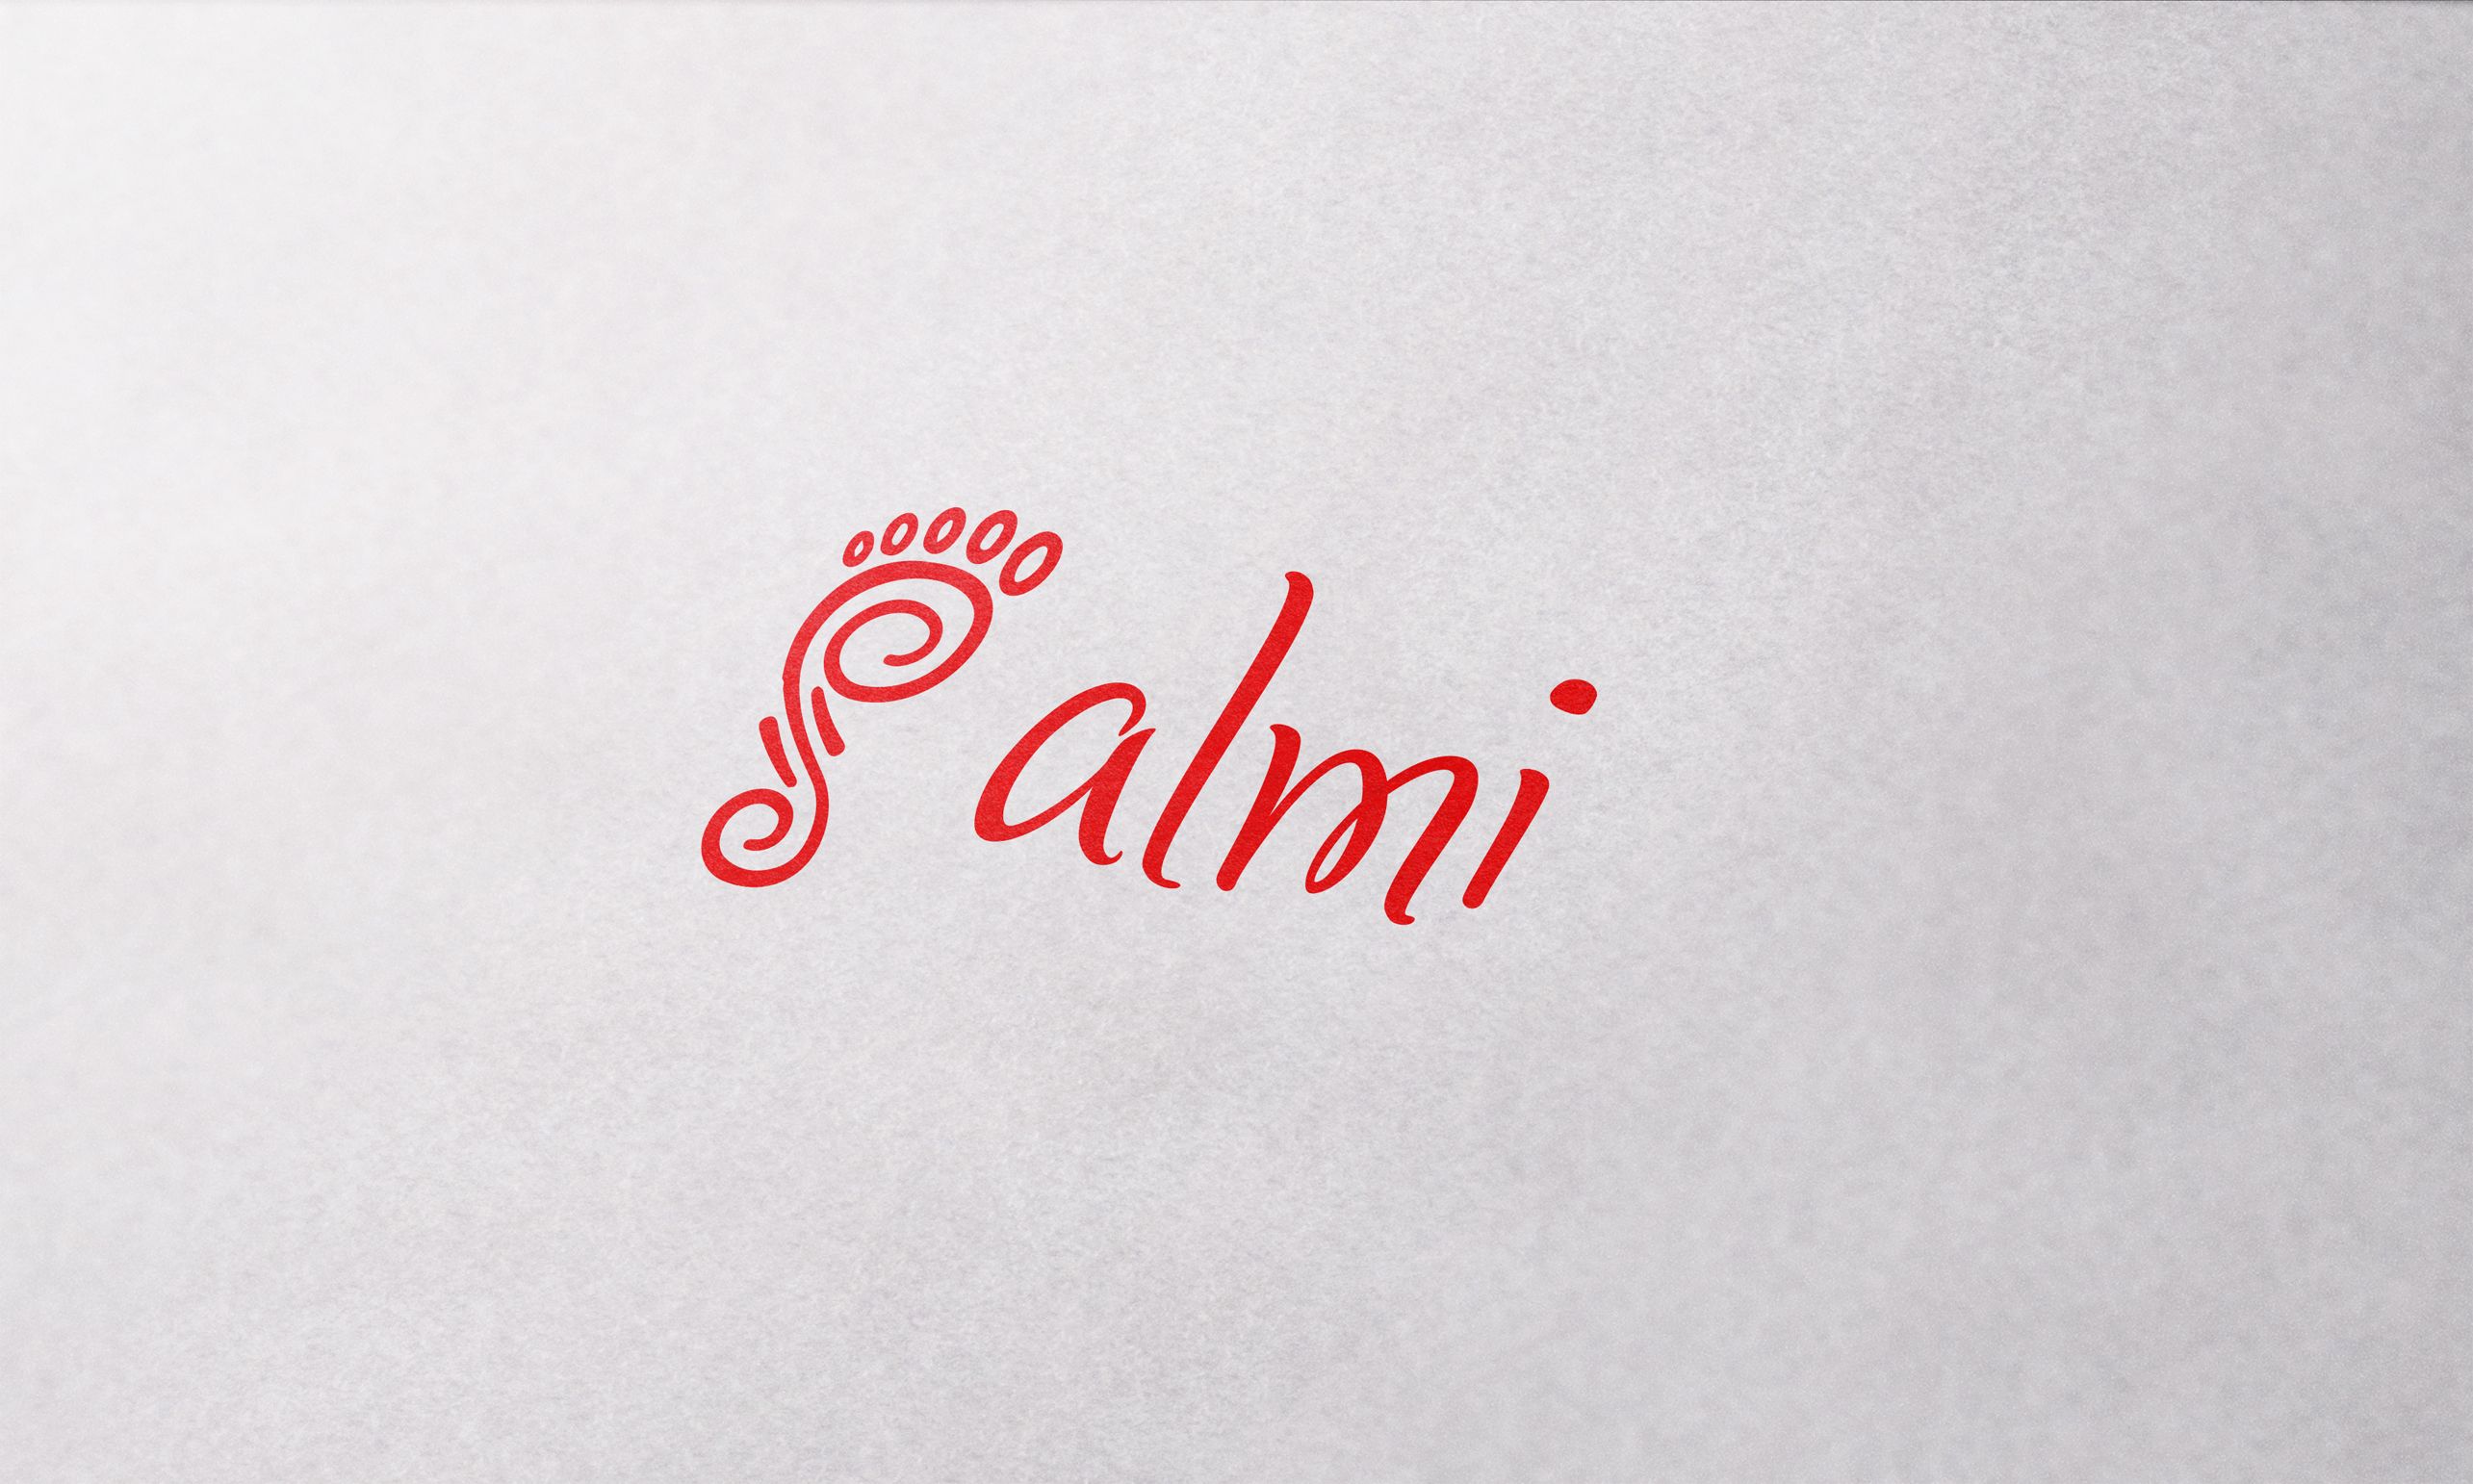 Дизайн логотипа обувной марки Алми фото f_20759ee7191d559a.jpg